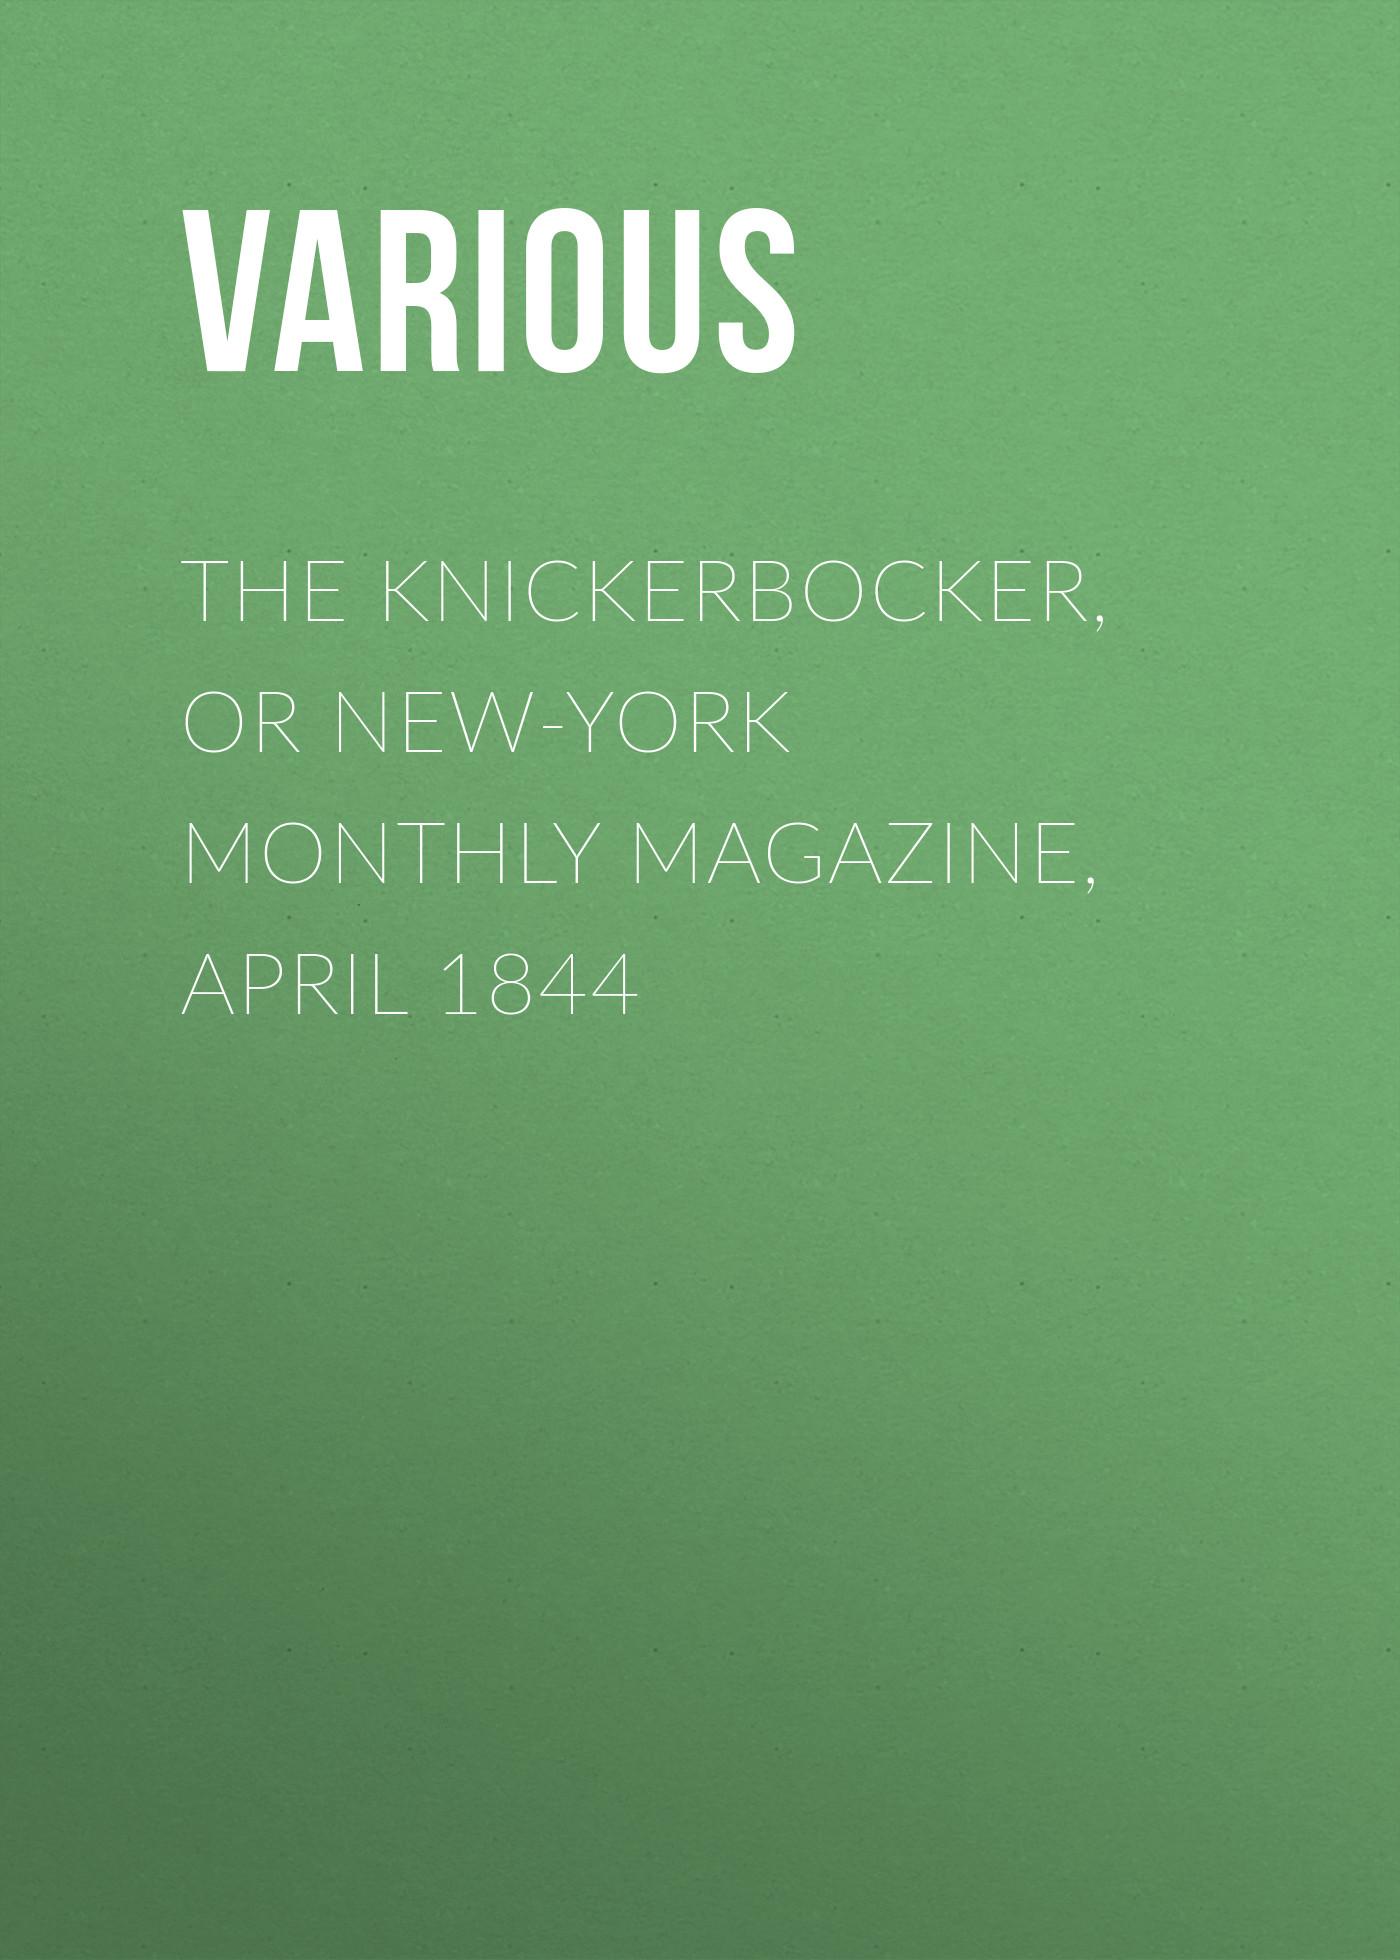 Various The Knickerbocker, or New-York Monthly Magazine, April 1844 maura jacobson new york magazine crosswords volume 7